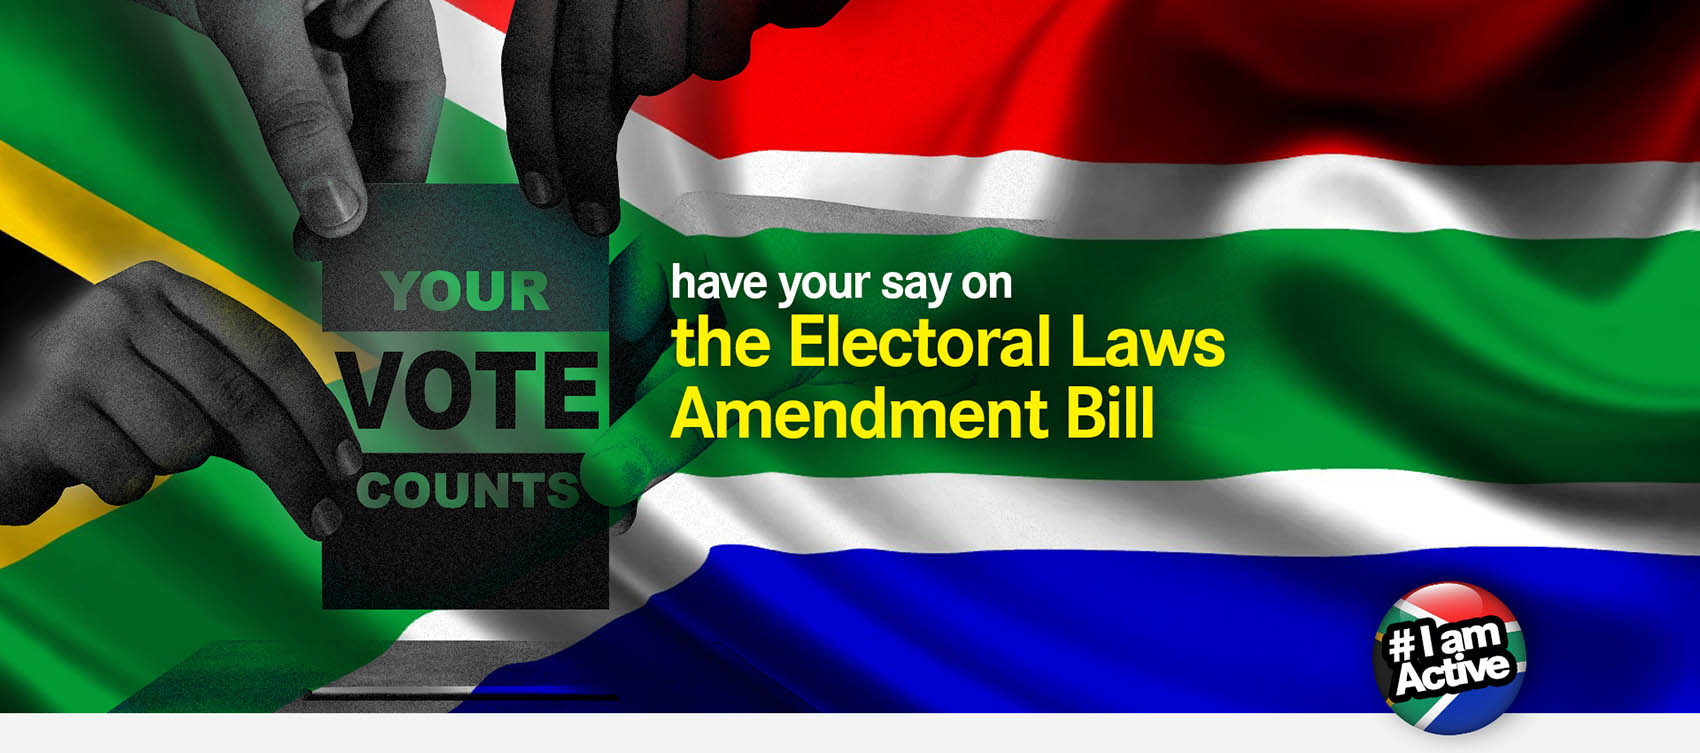 DearSA-Electoral-Laws-Amendment-Bill